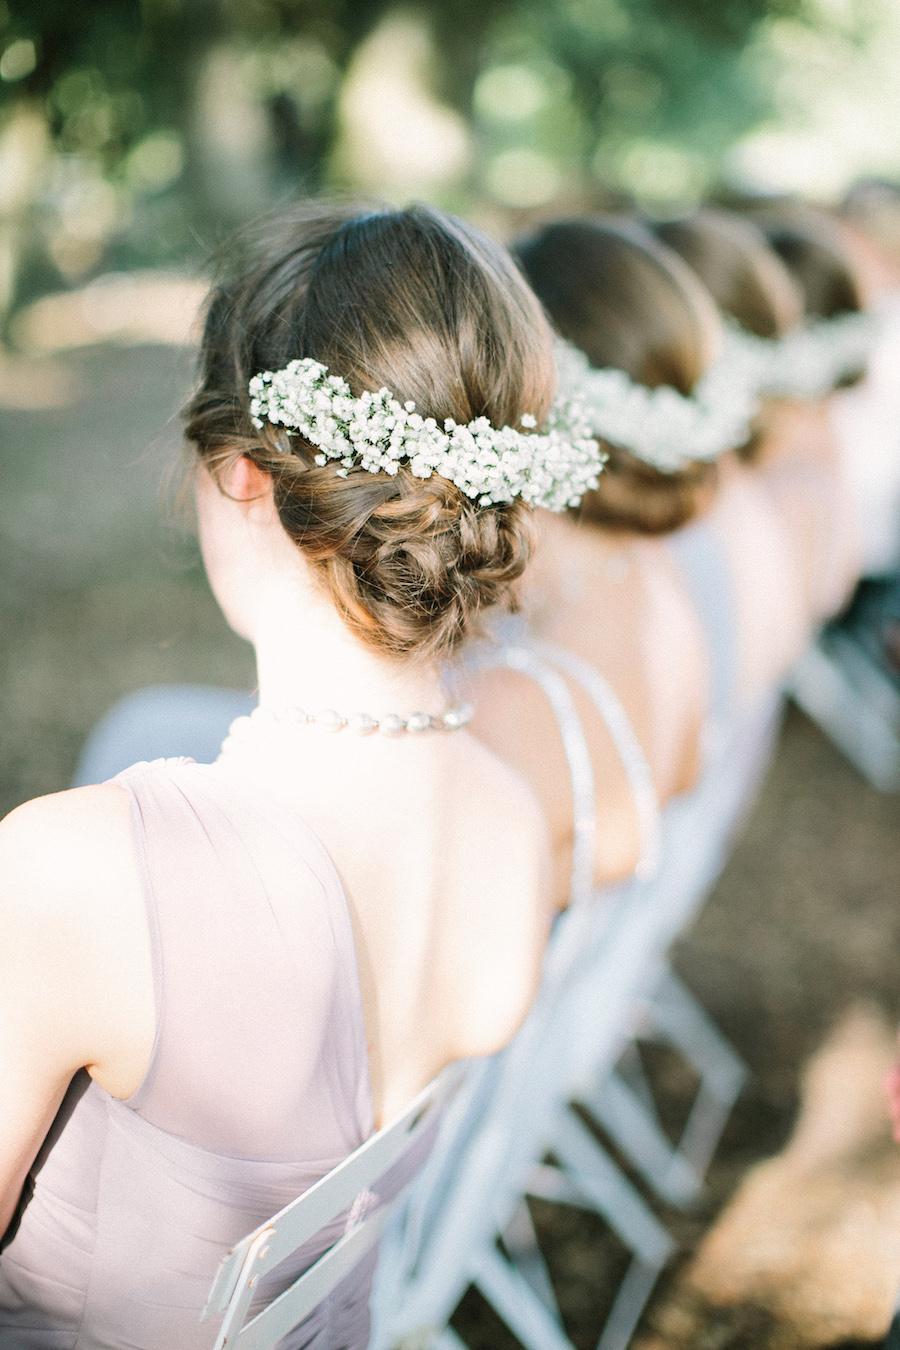 saya-photography-rustic-french-wedding-provence-domaines-de-patras-84.jpg